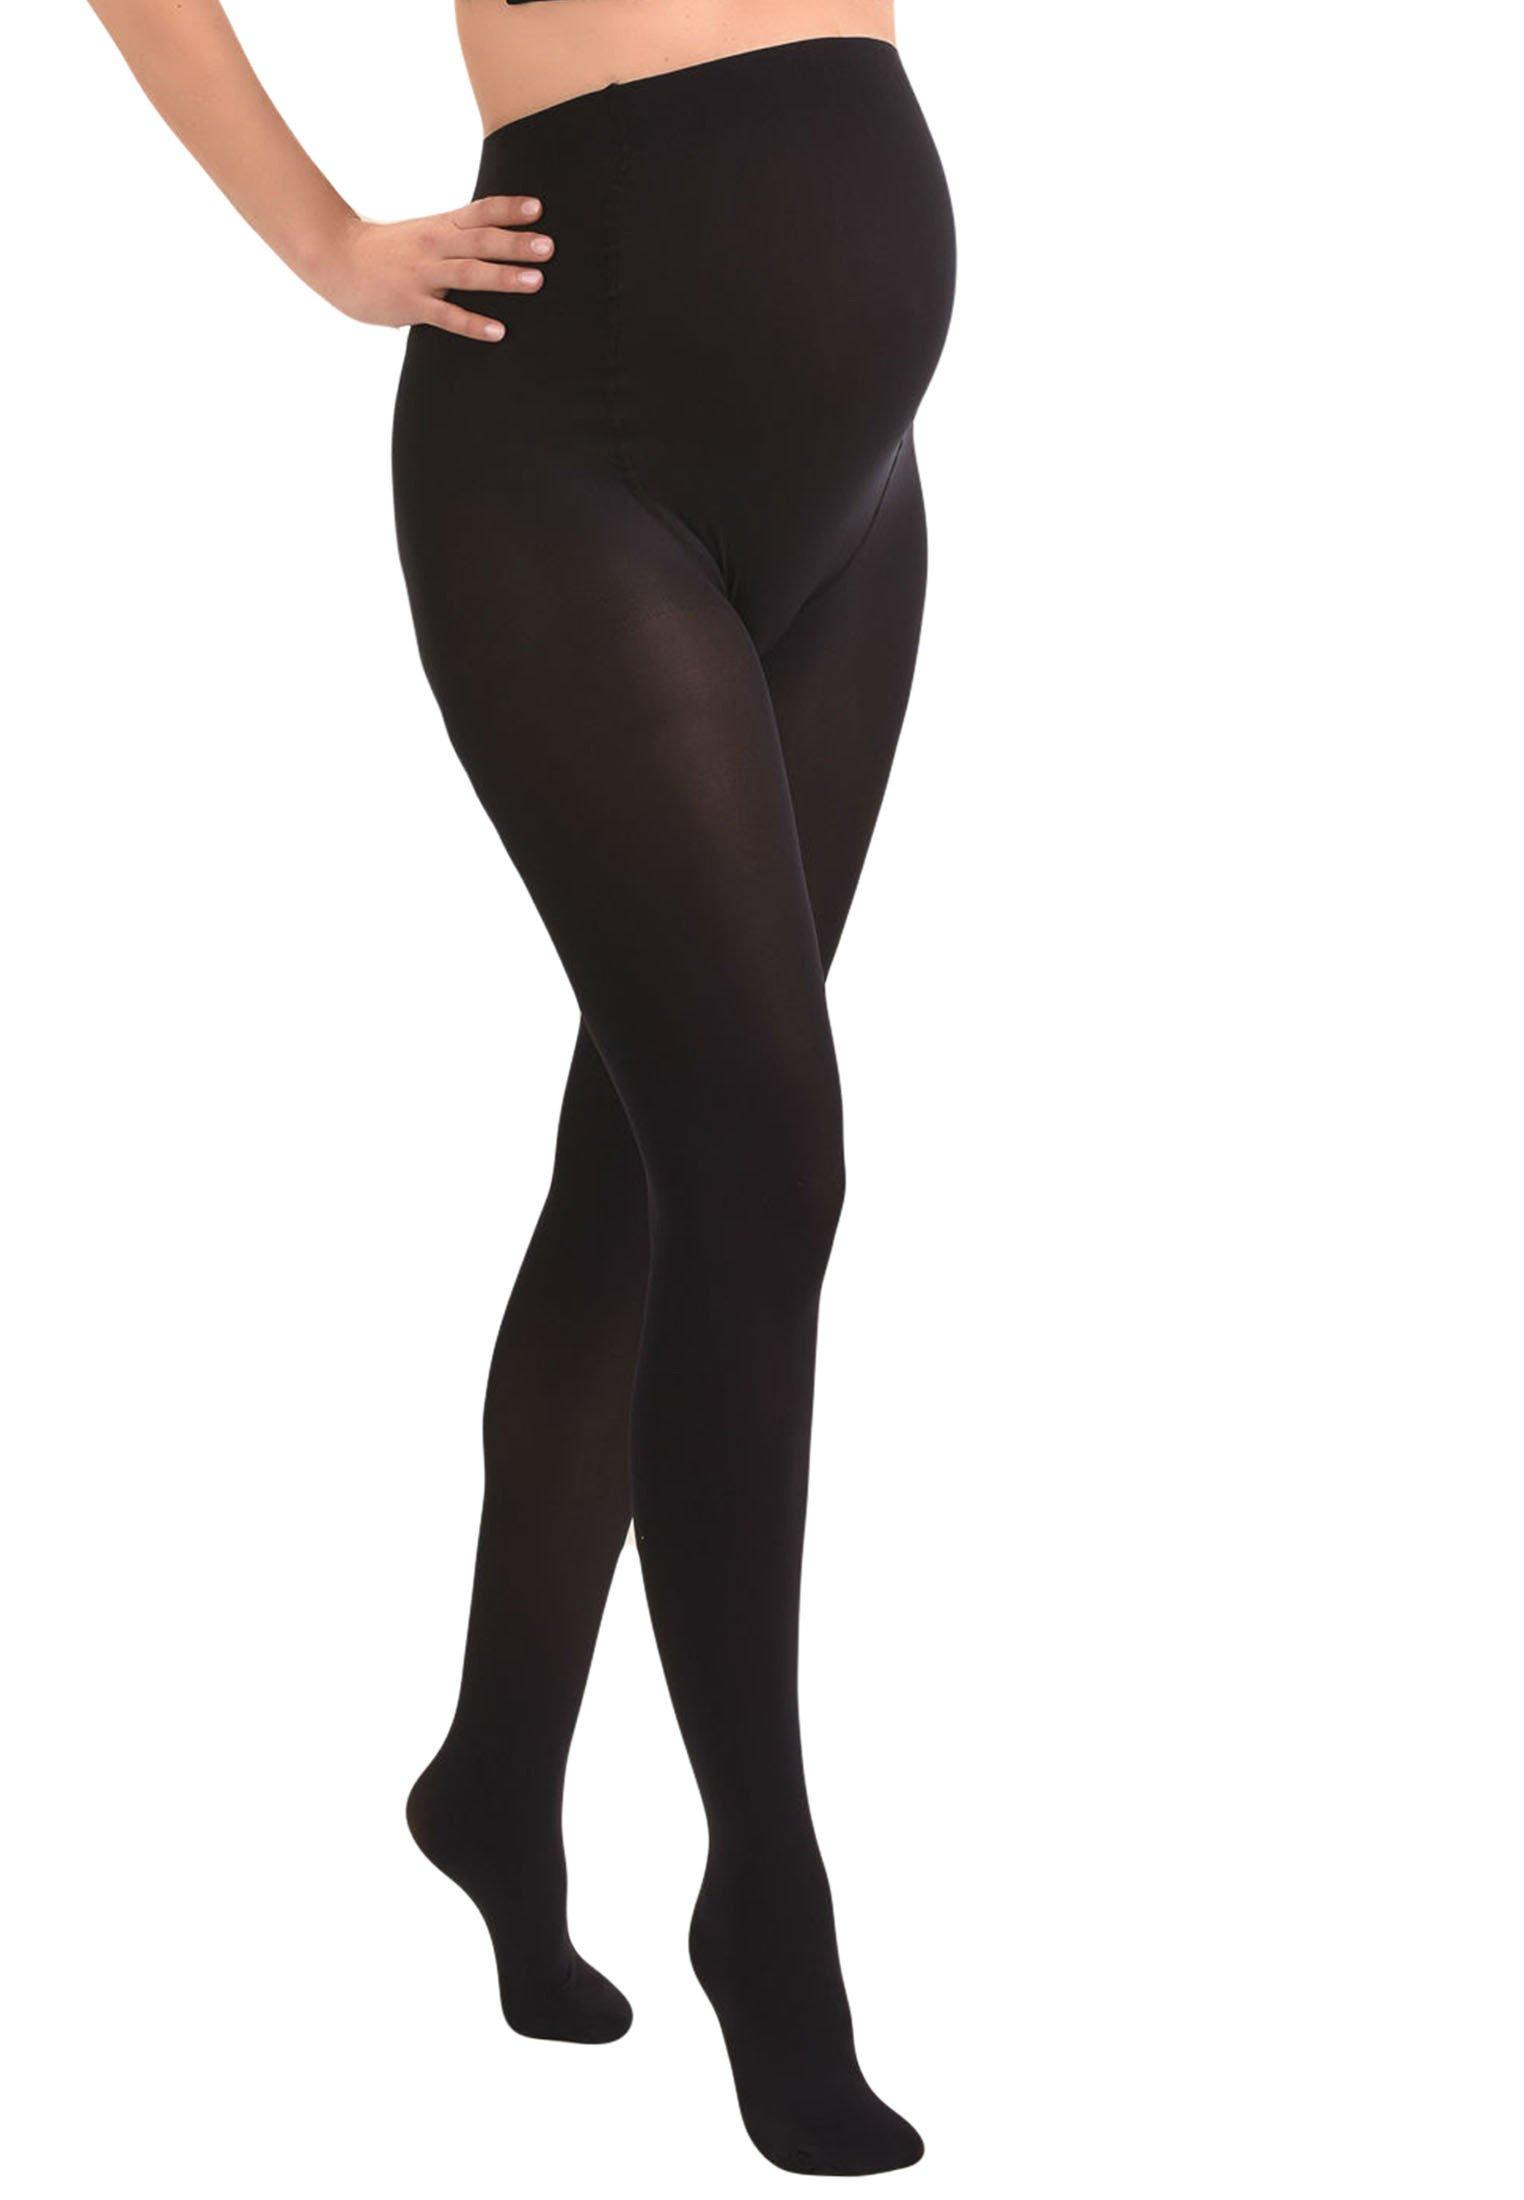 Femme OPAQUE 60DEN - Collants